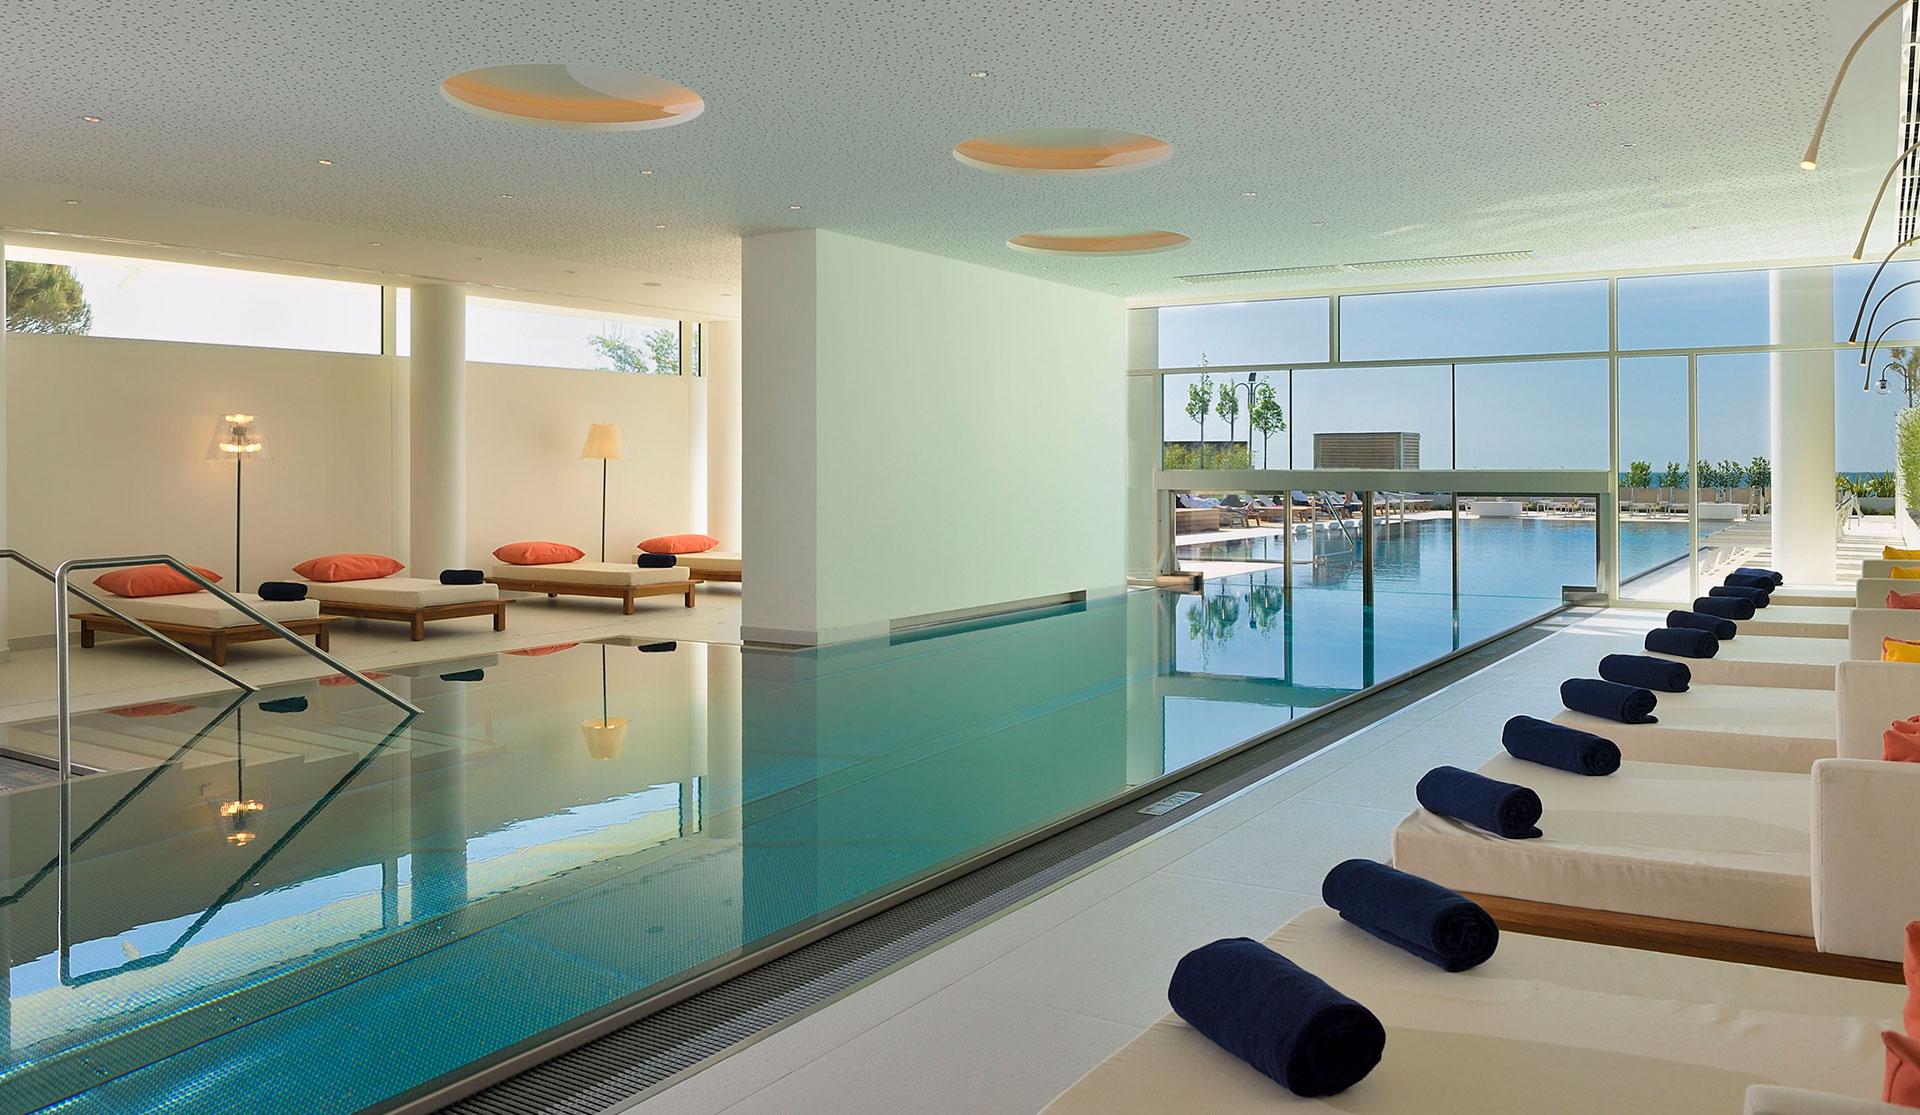 hotel spa interior falkensteiner matteo thun partners. Black Bedroom Furniture Sets. Home Design Ideas